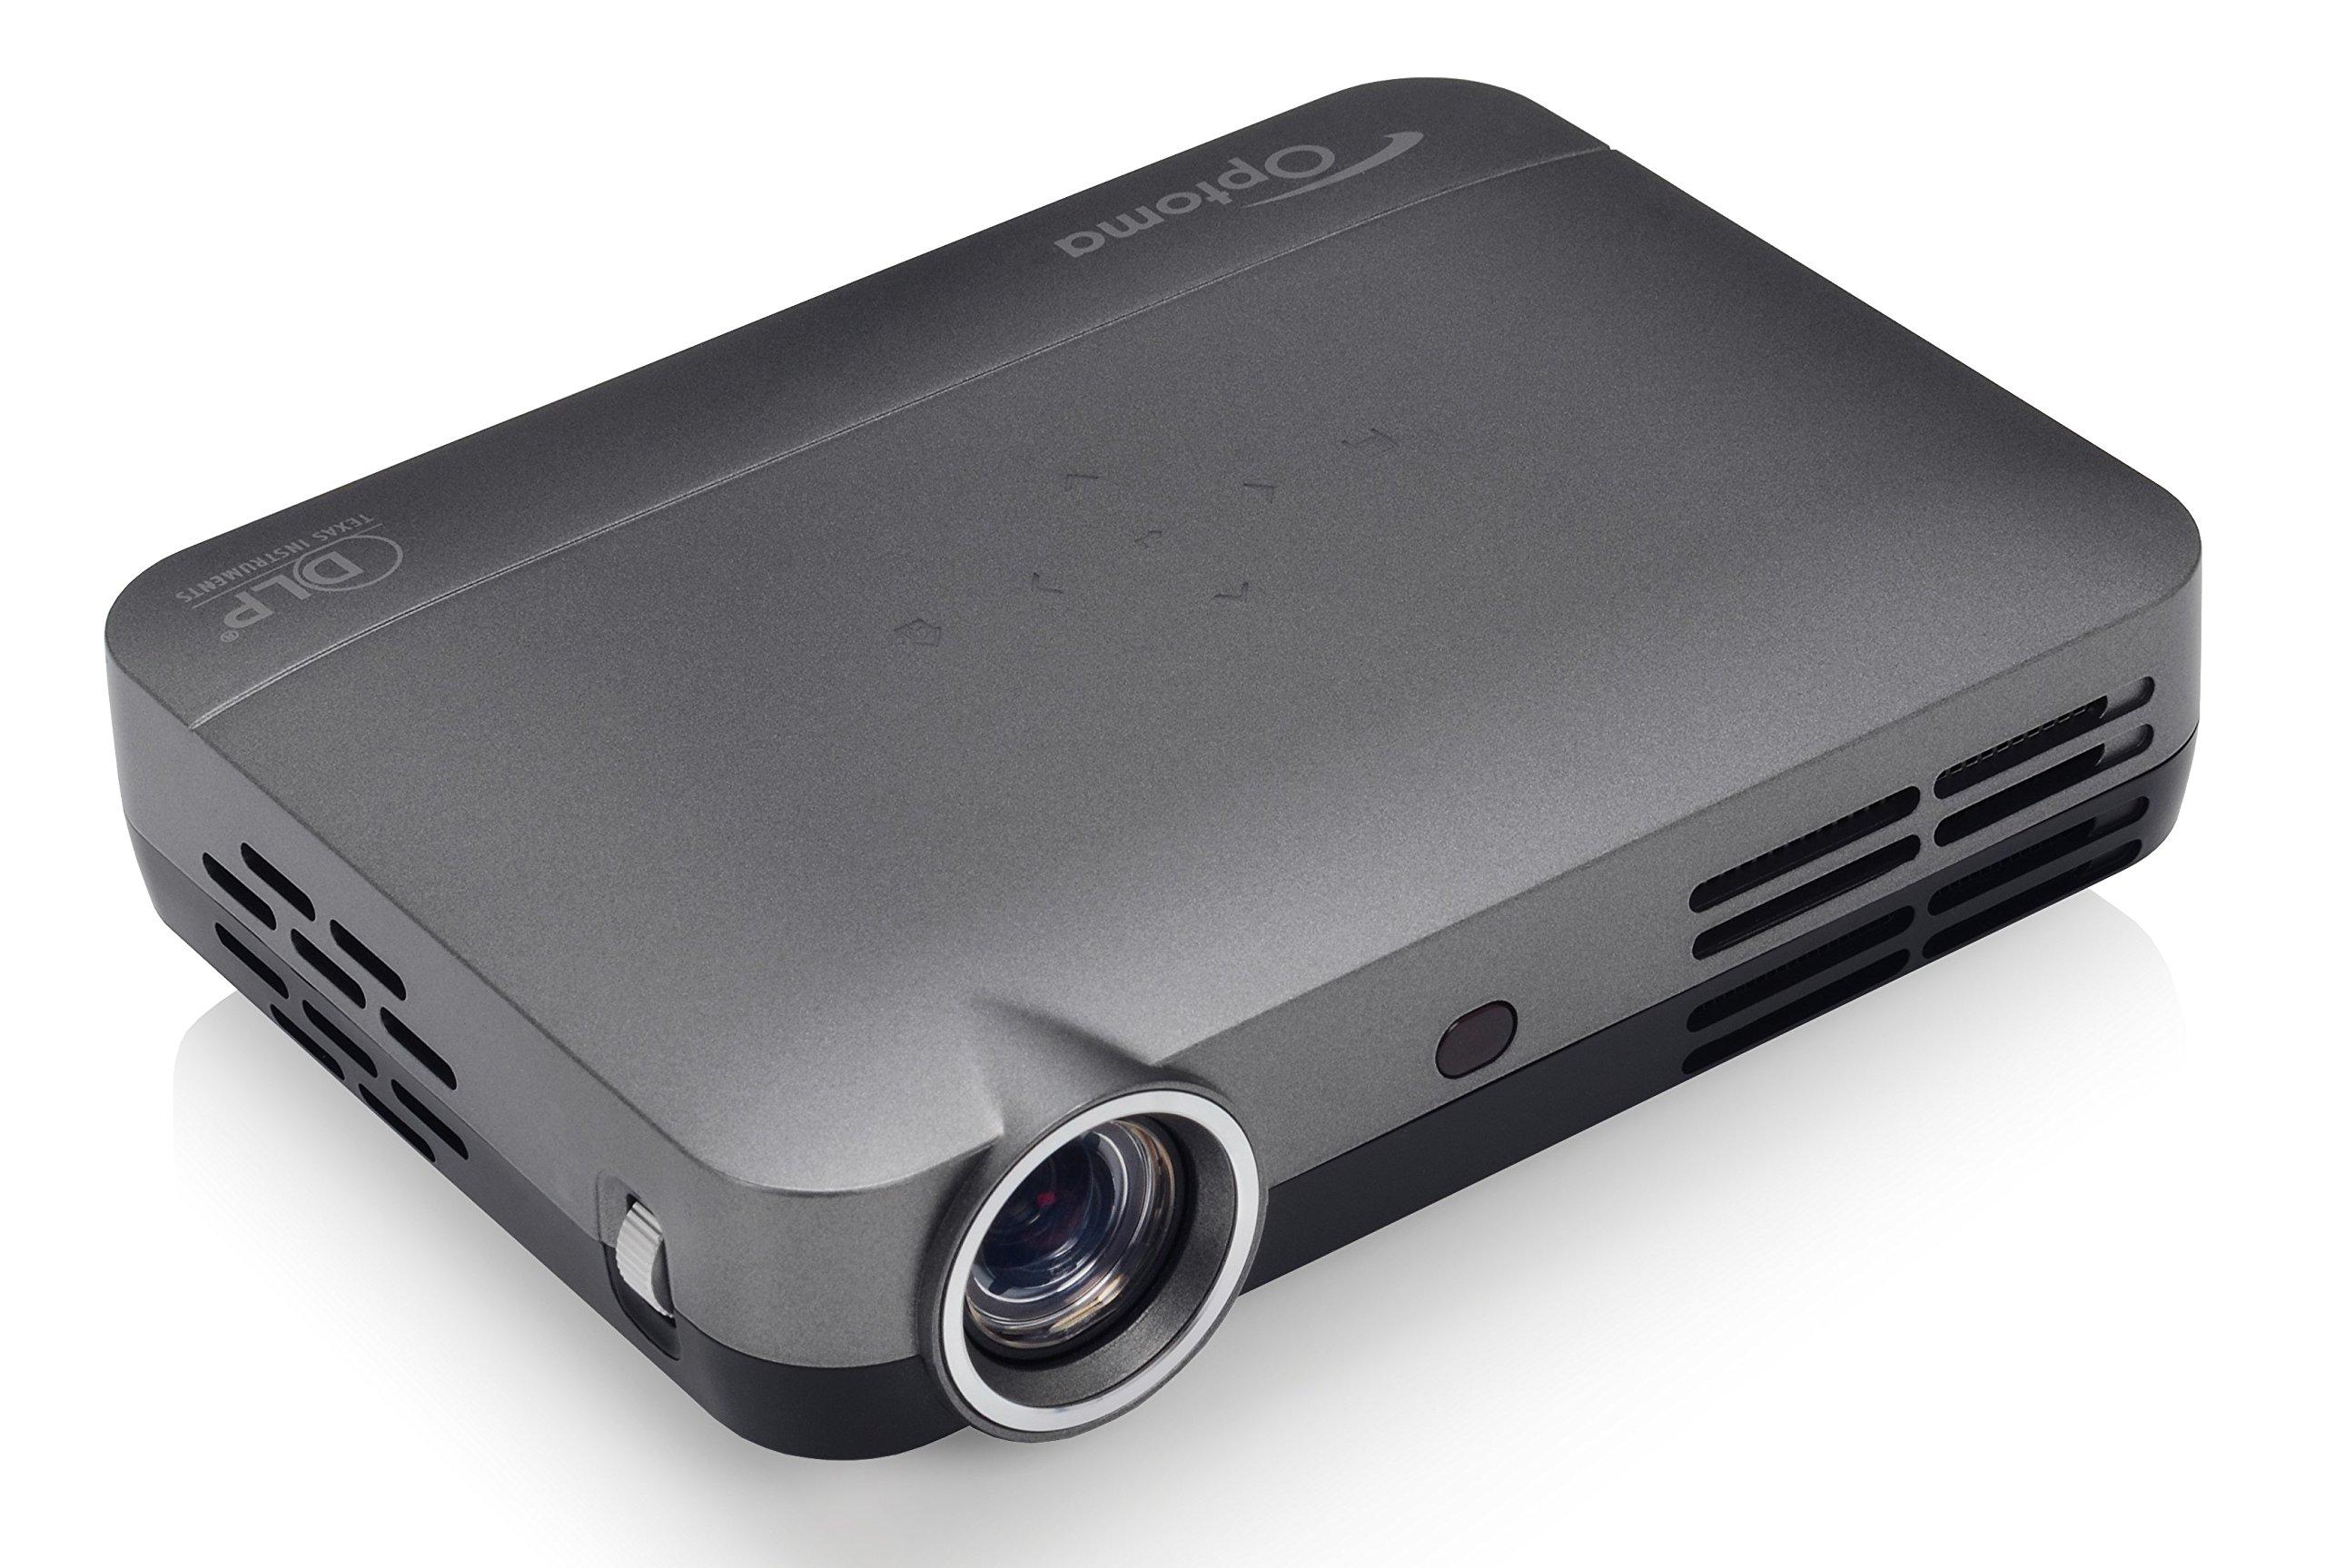 81GSRAfP1wL - Optoma ML330 500 LED Brightness Ultra-Compact Android LED Projector - Grey/Black